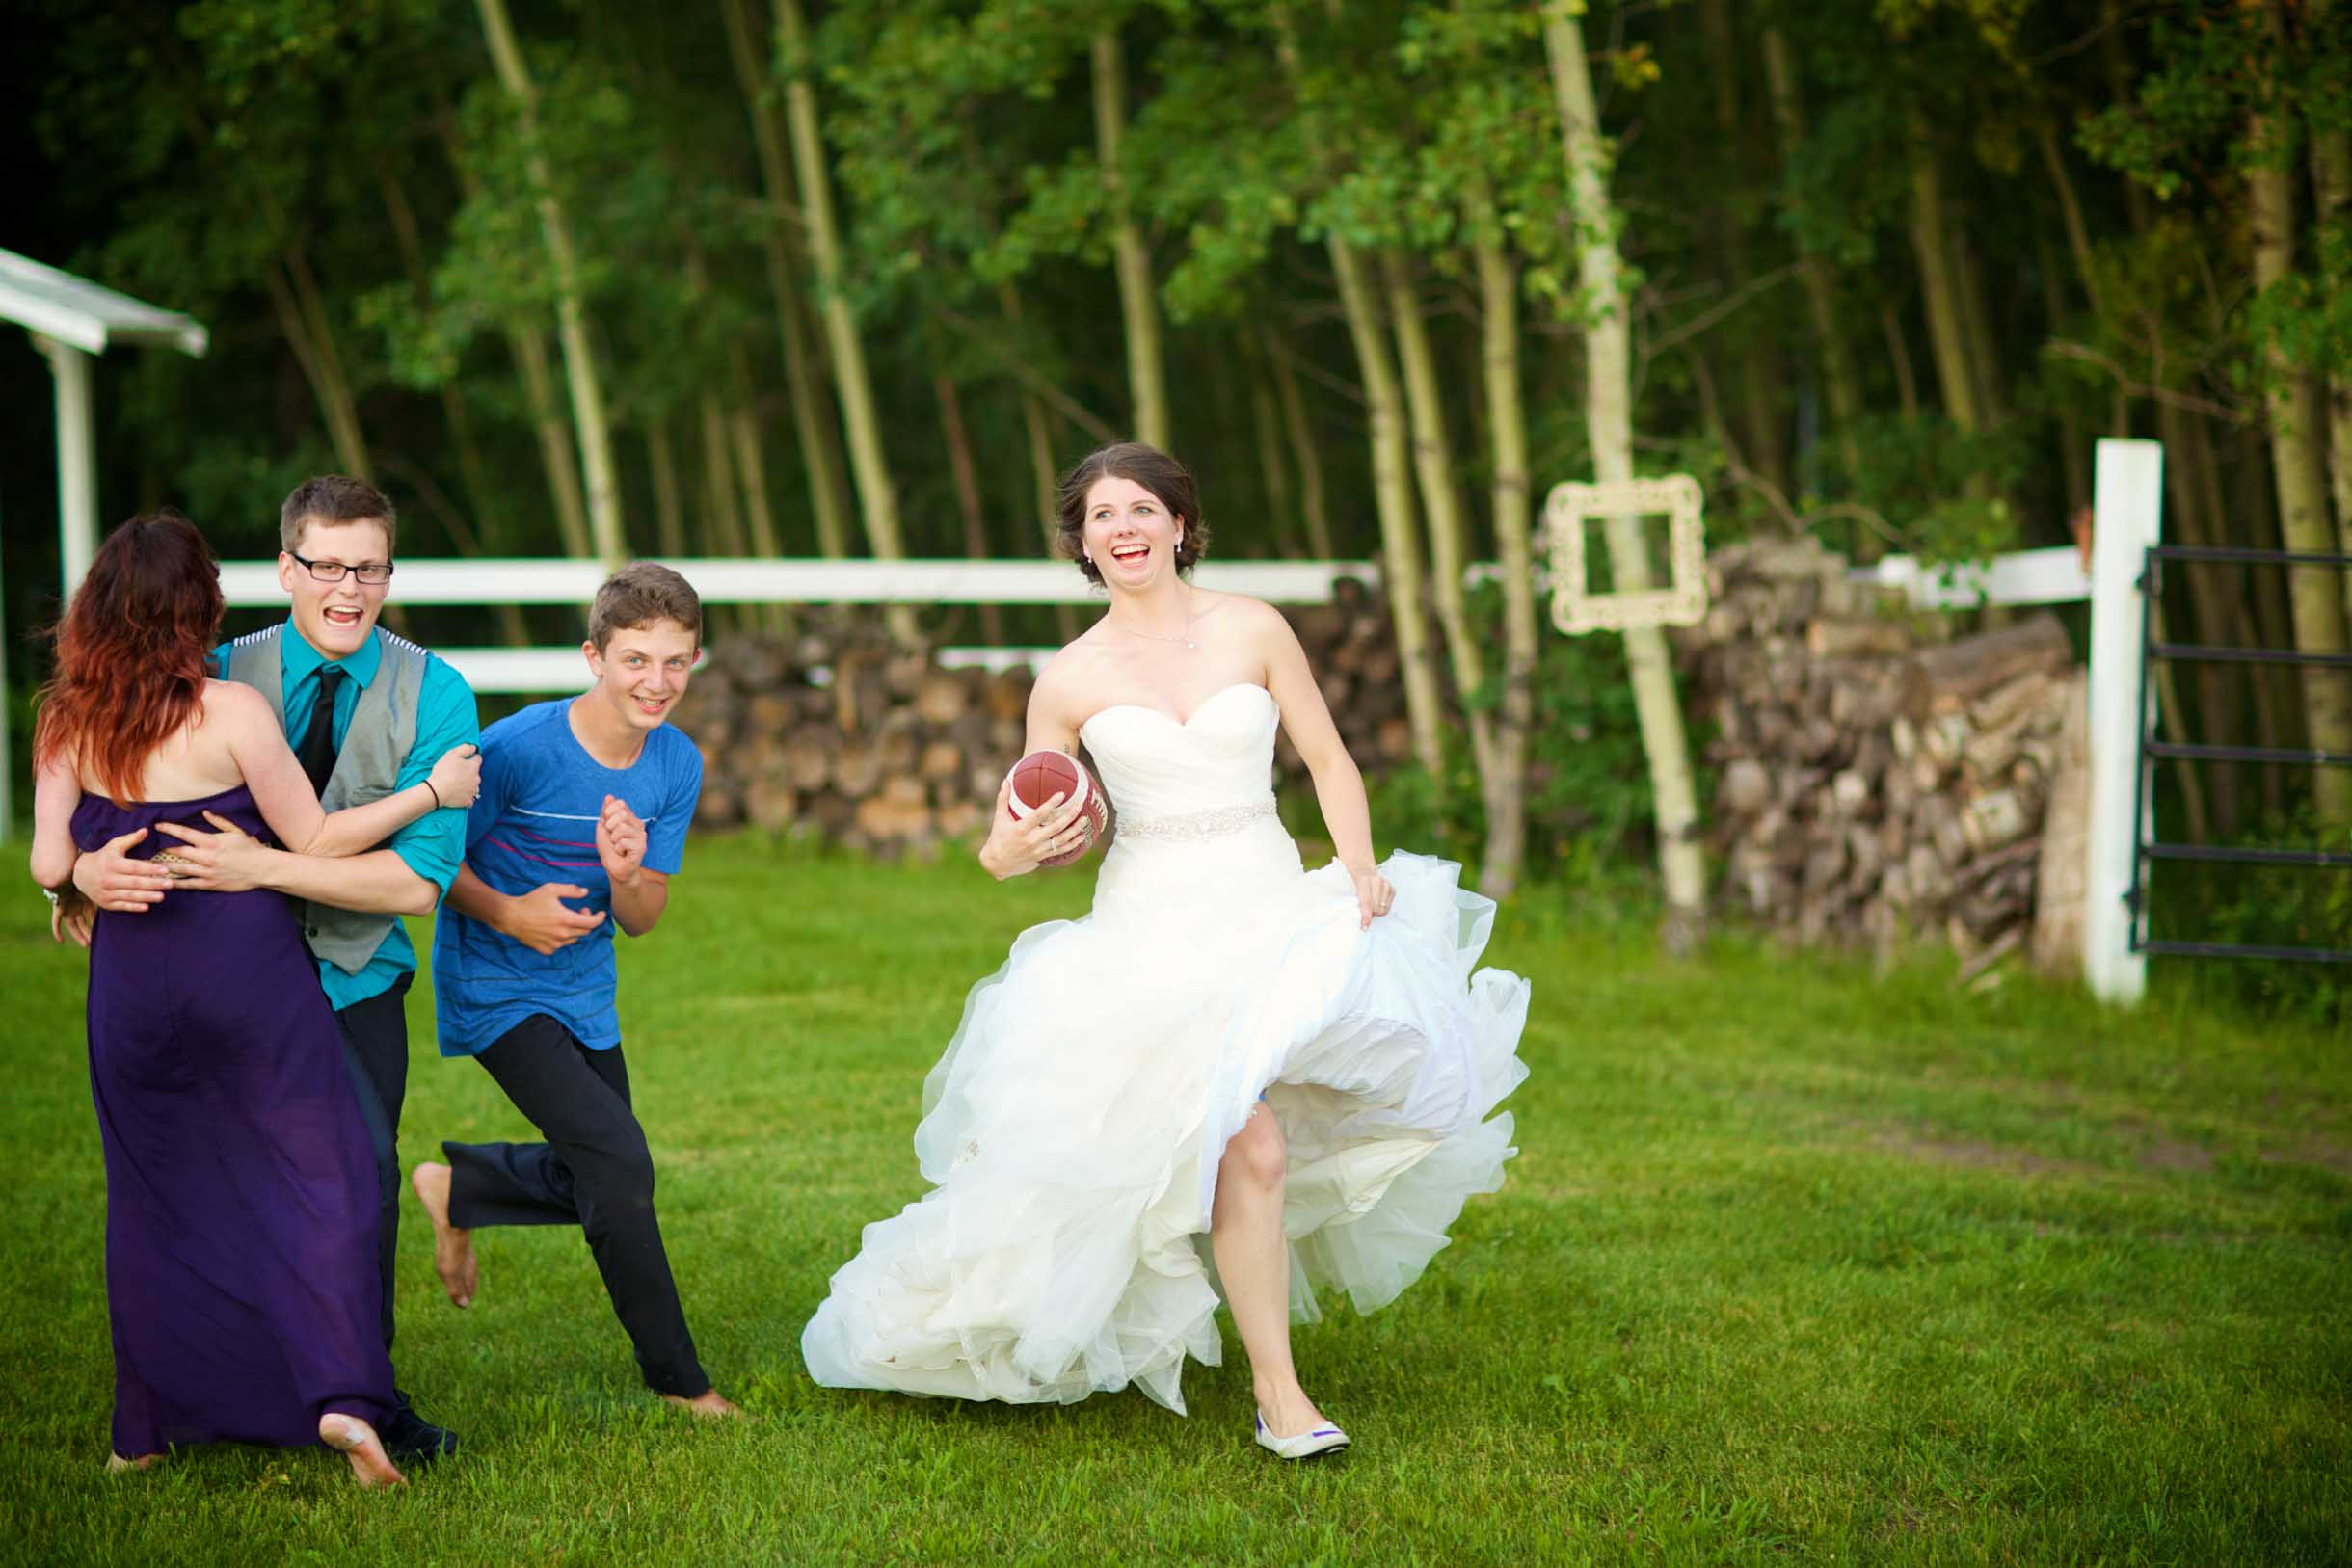 Wedding game ideas football